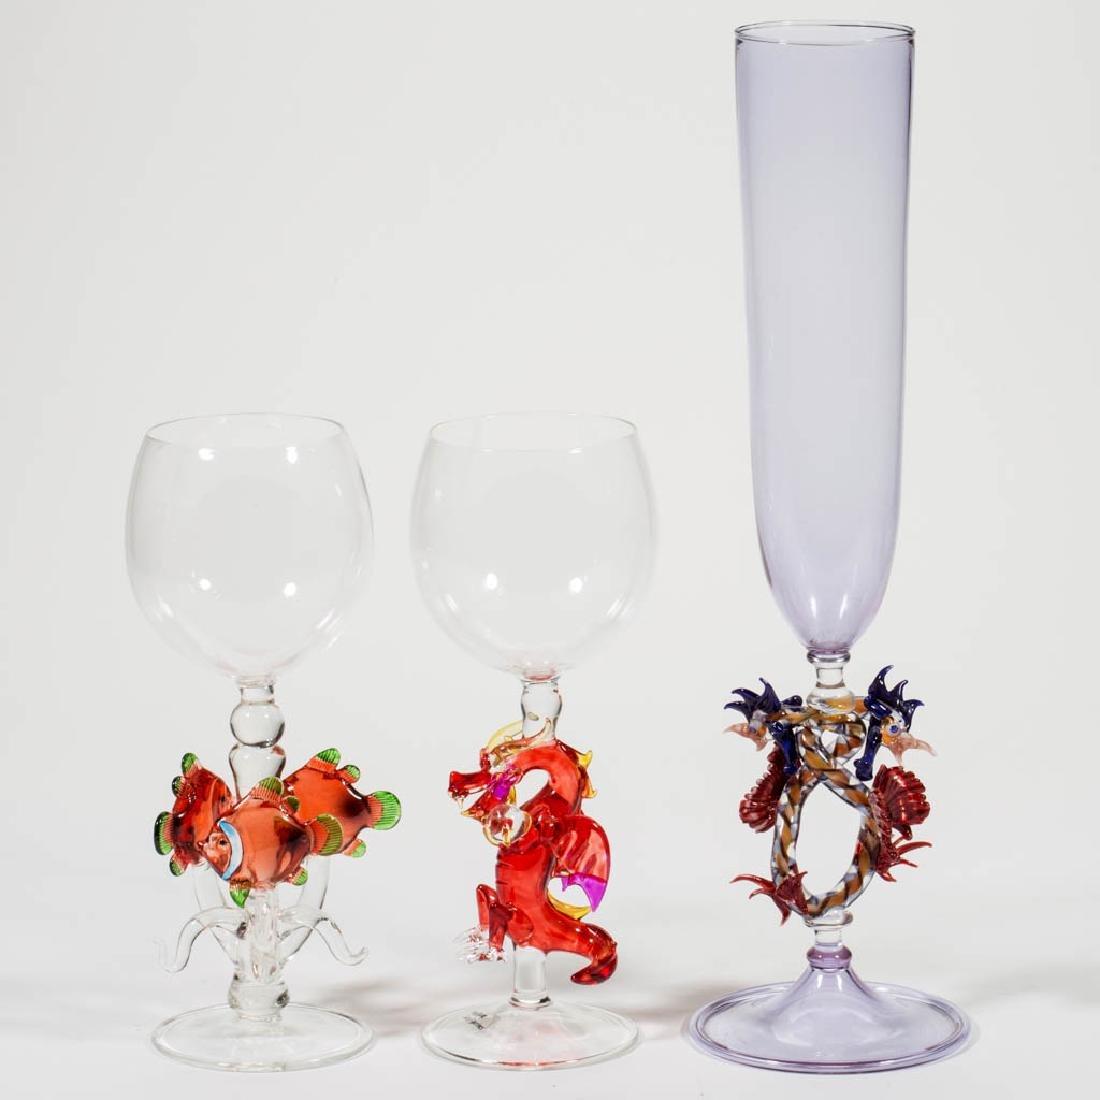 ASSORTED FIGURAL STEM STUDIO ART GLASS ARTICLES, LOT OF